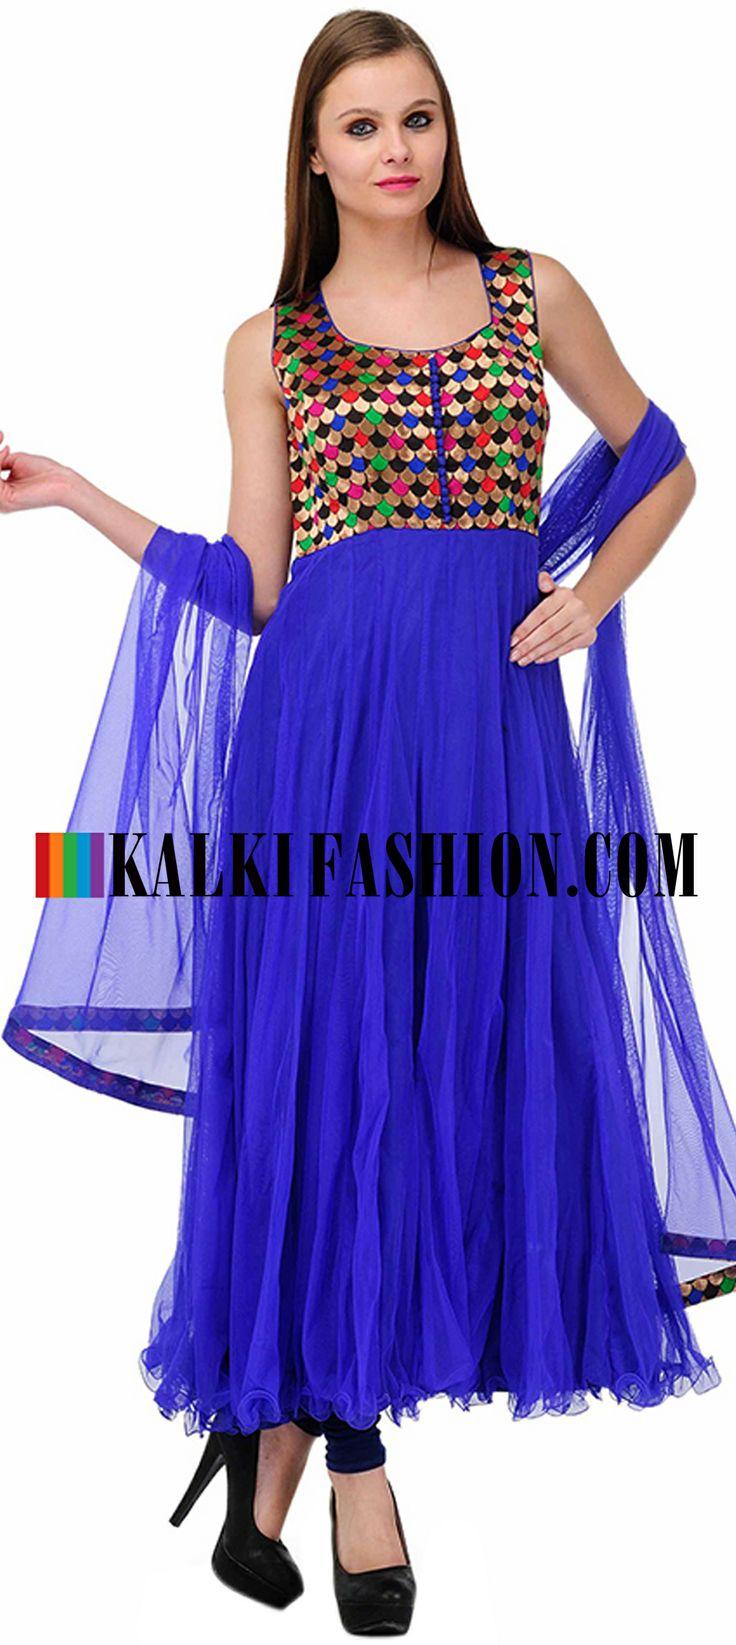 Buy Online from the link below. We ship worldwide (Free Shipping over US$100)  http://www.kalkifashion.com/blue-embellished-anarkali-suit-set.html